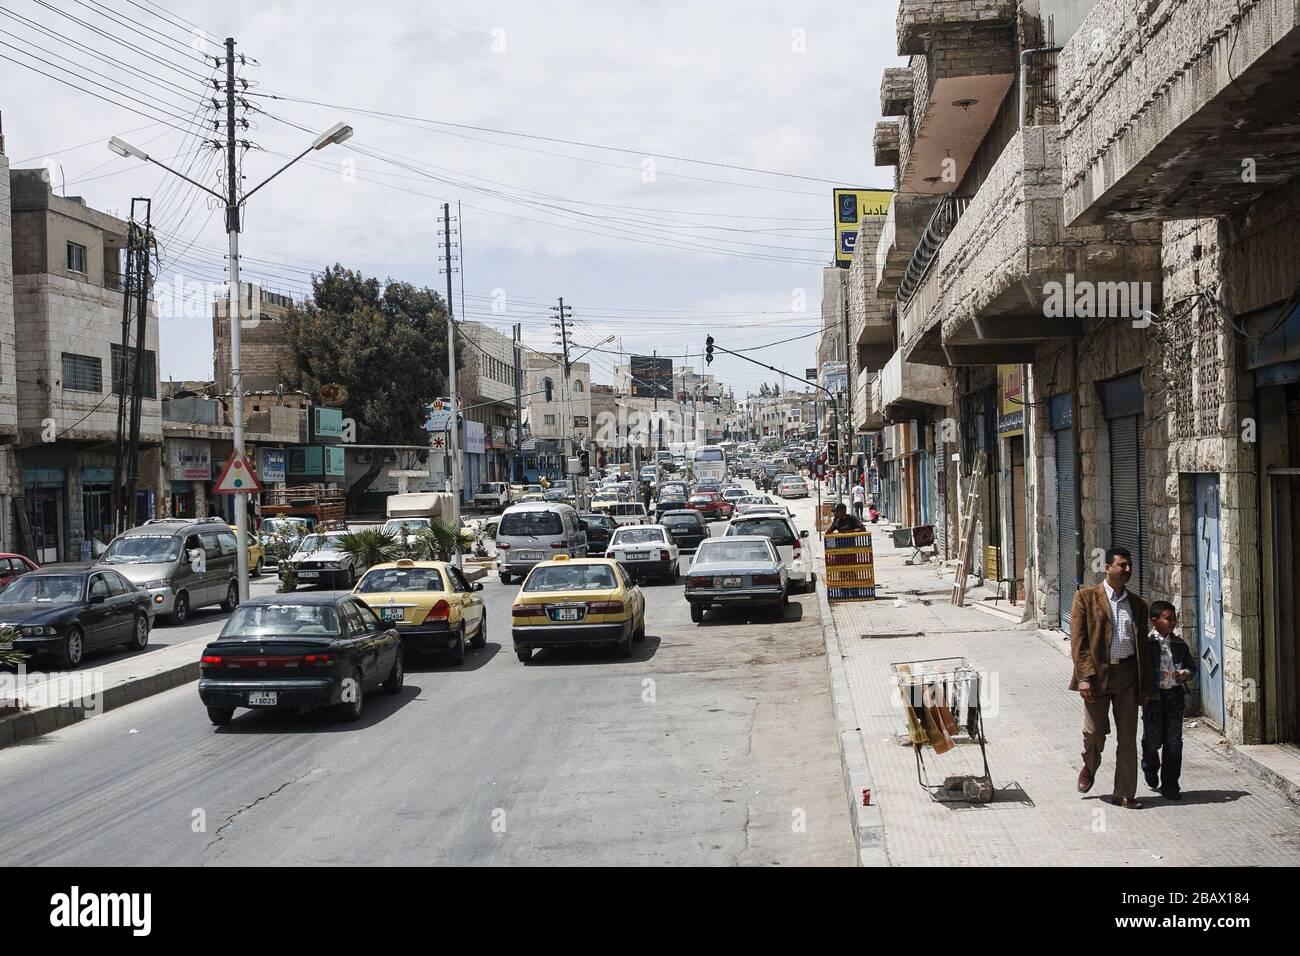 Madaba, Jordan, May 1, 2009: Heavy traffic in the street of Madaba, Jordan, and a man and a boy walking on the sidewalk. Stock Photo